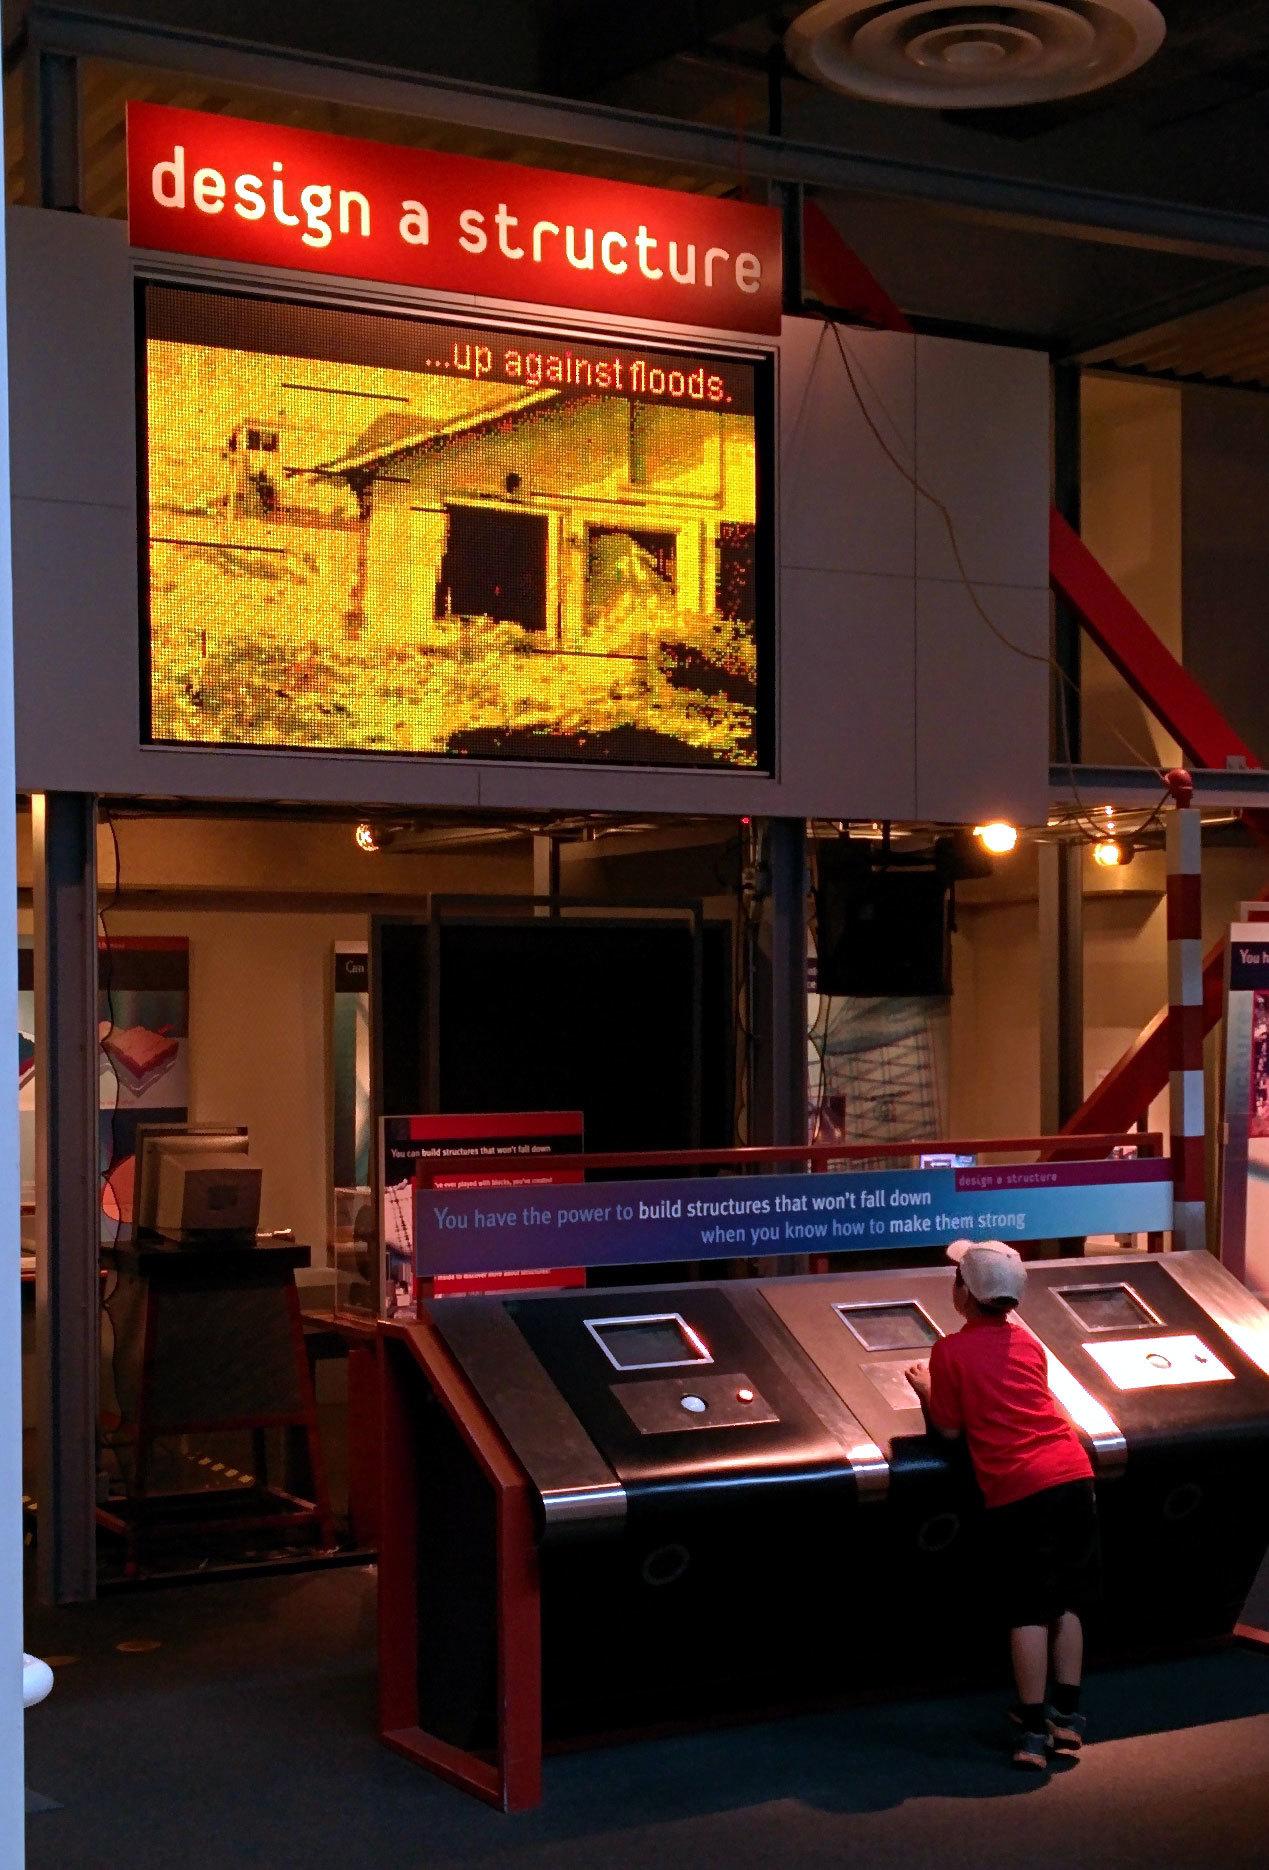 California Science Center Design a structure exhibit